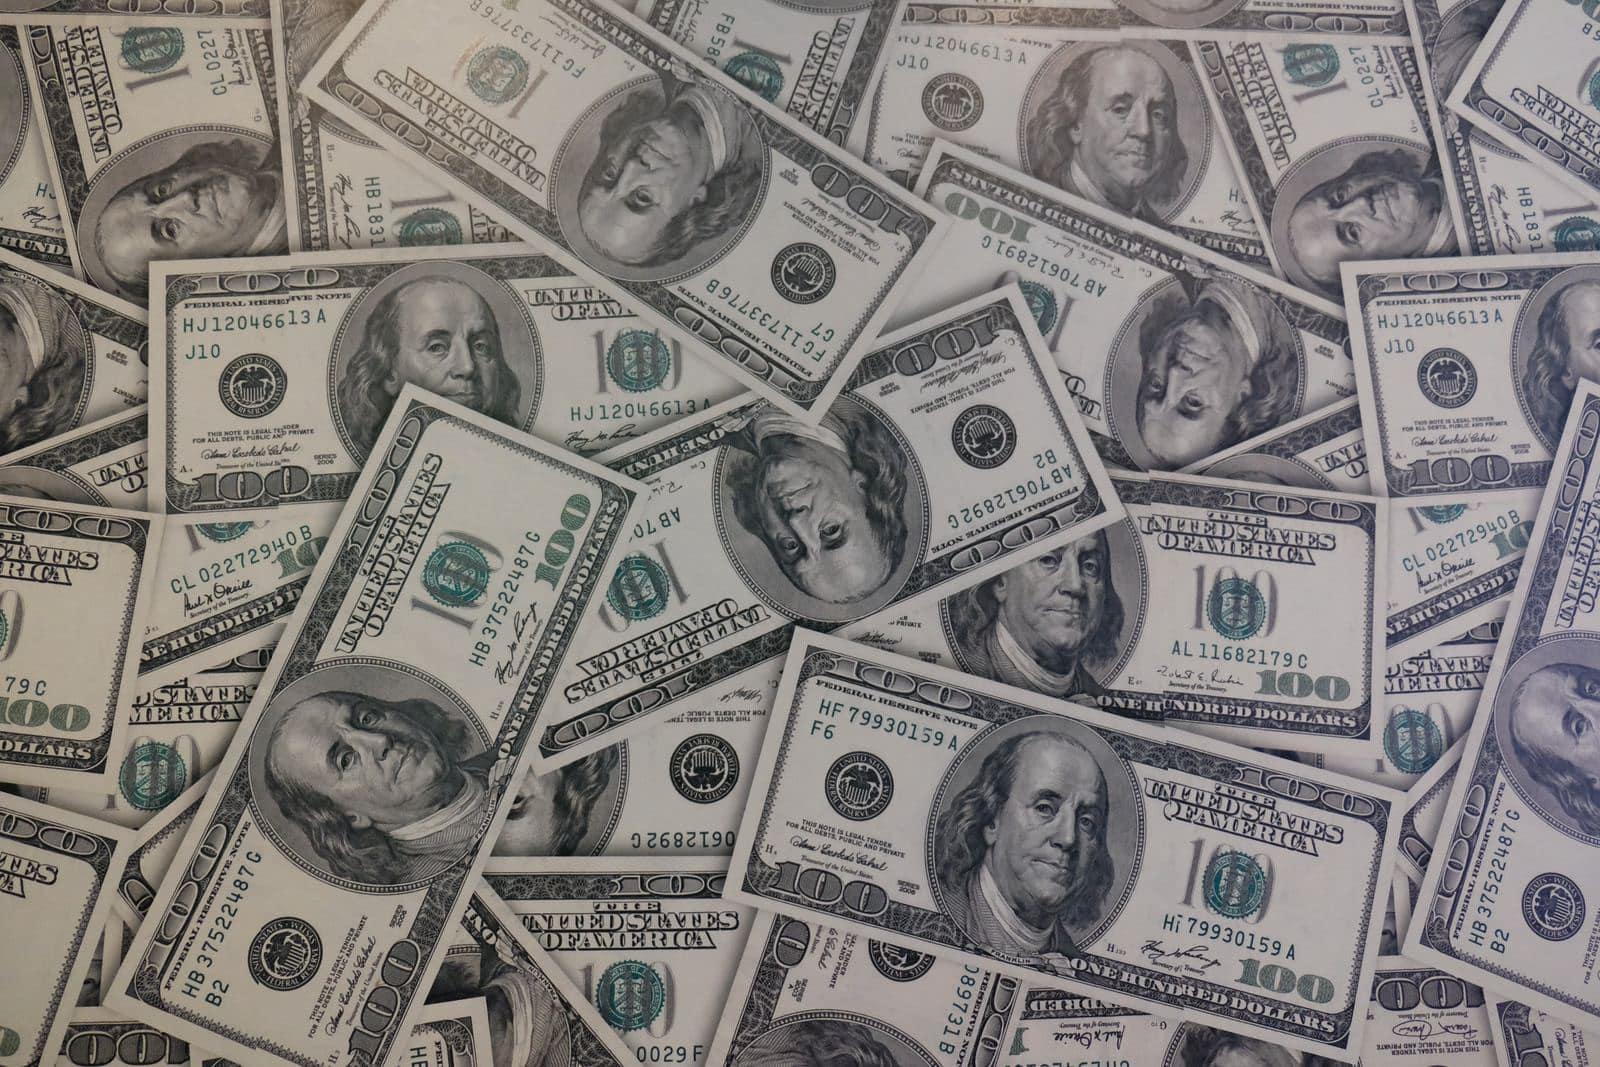 100 U.S. dollar banknote lot